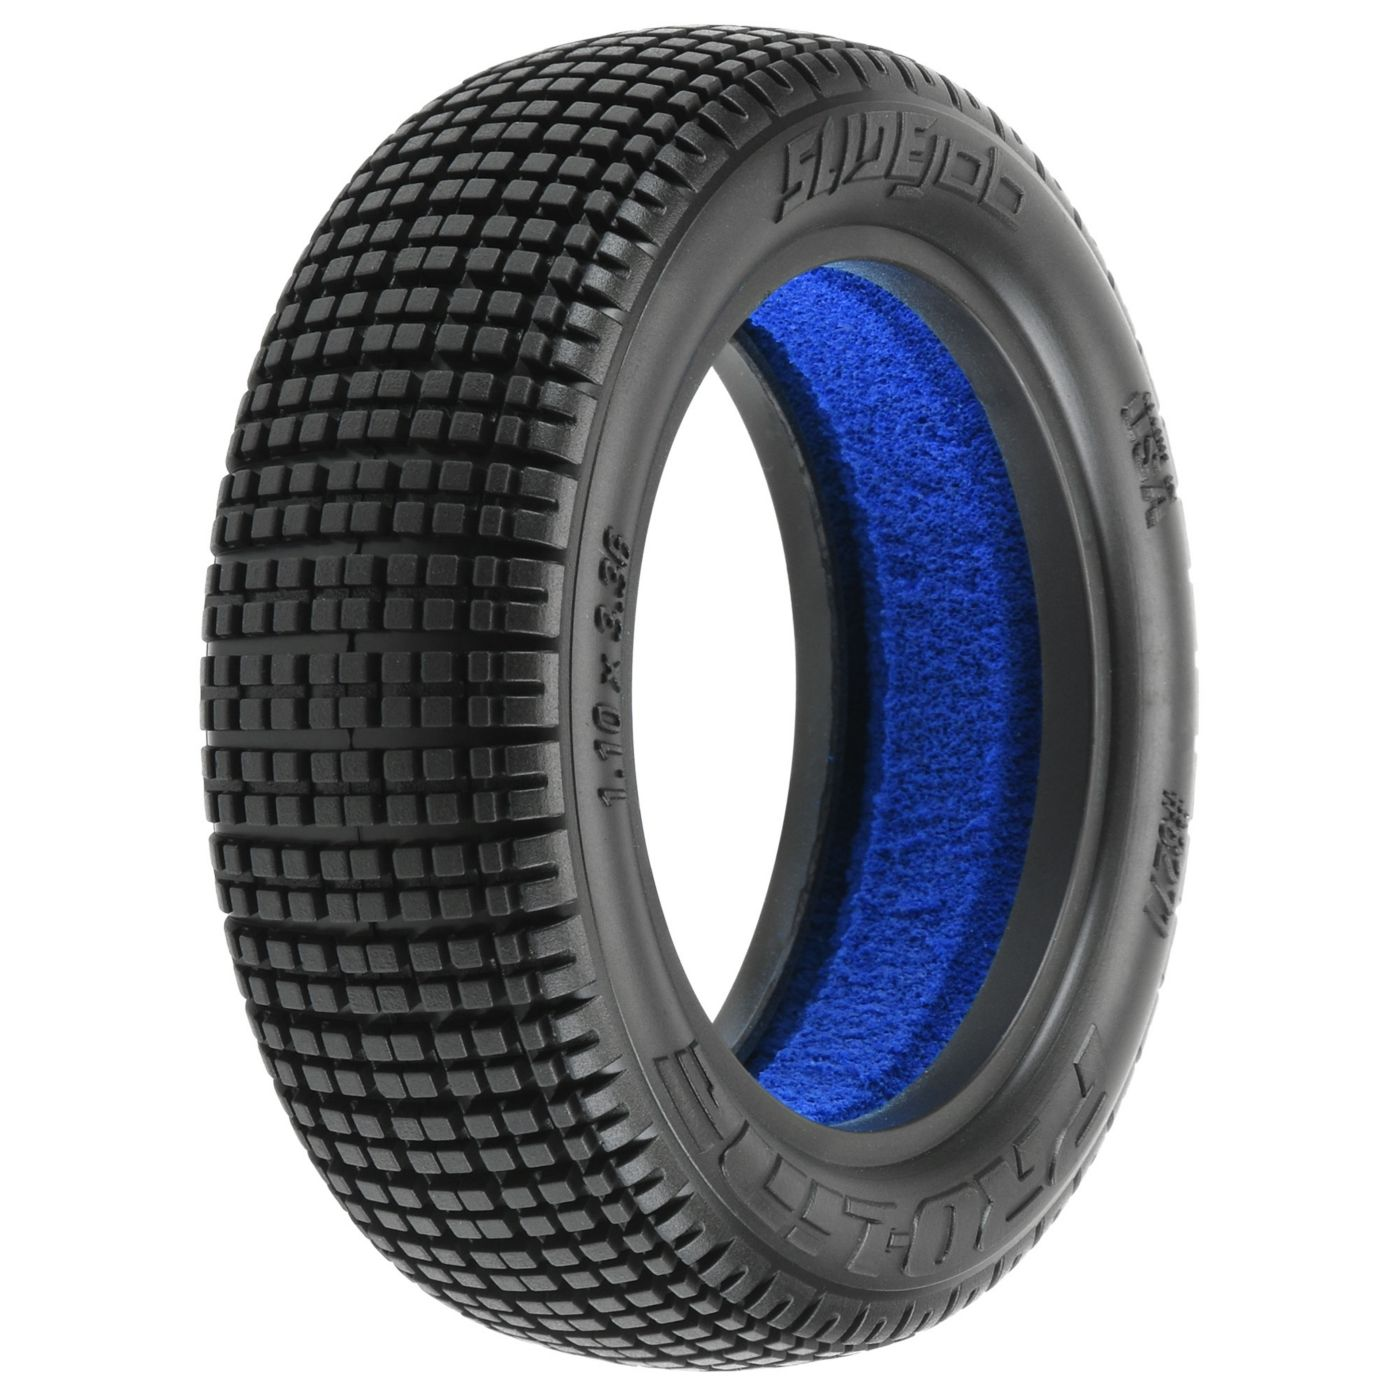 Slide Job 2.2 2WD M3 Buggy Front Tire (2)  (PRO827102)